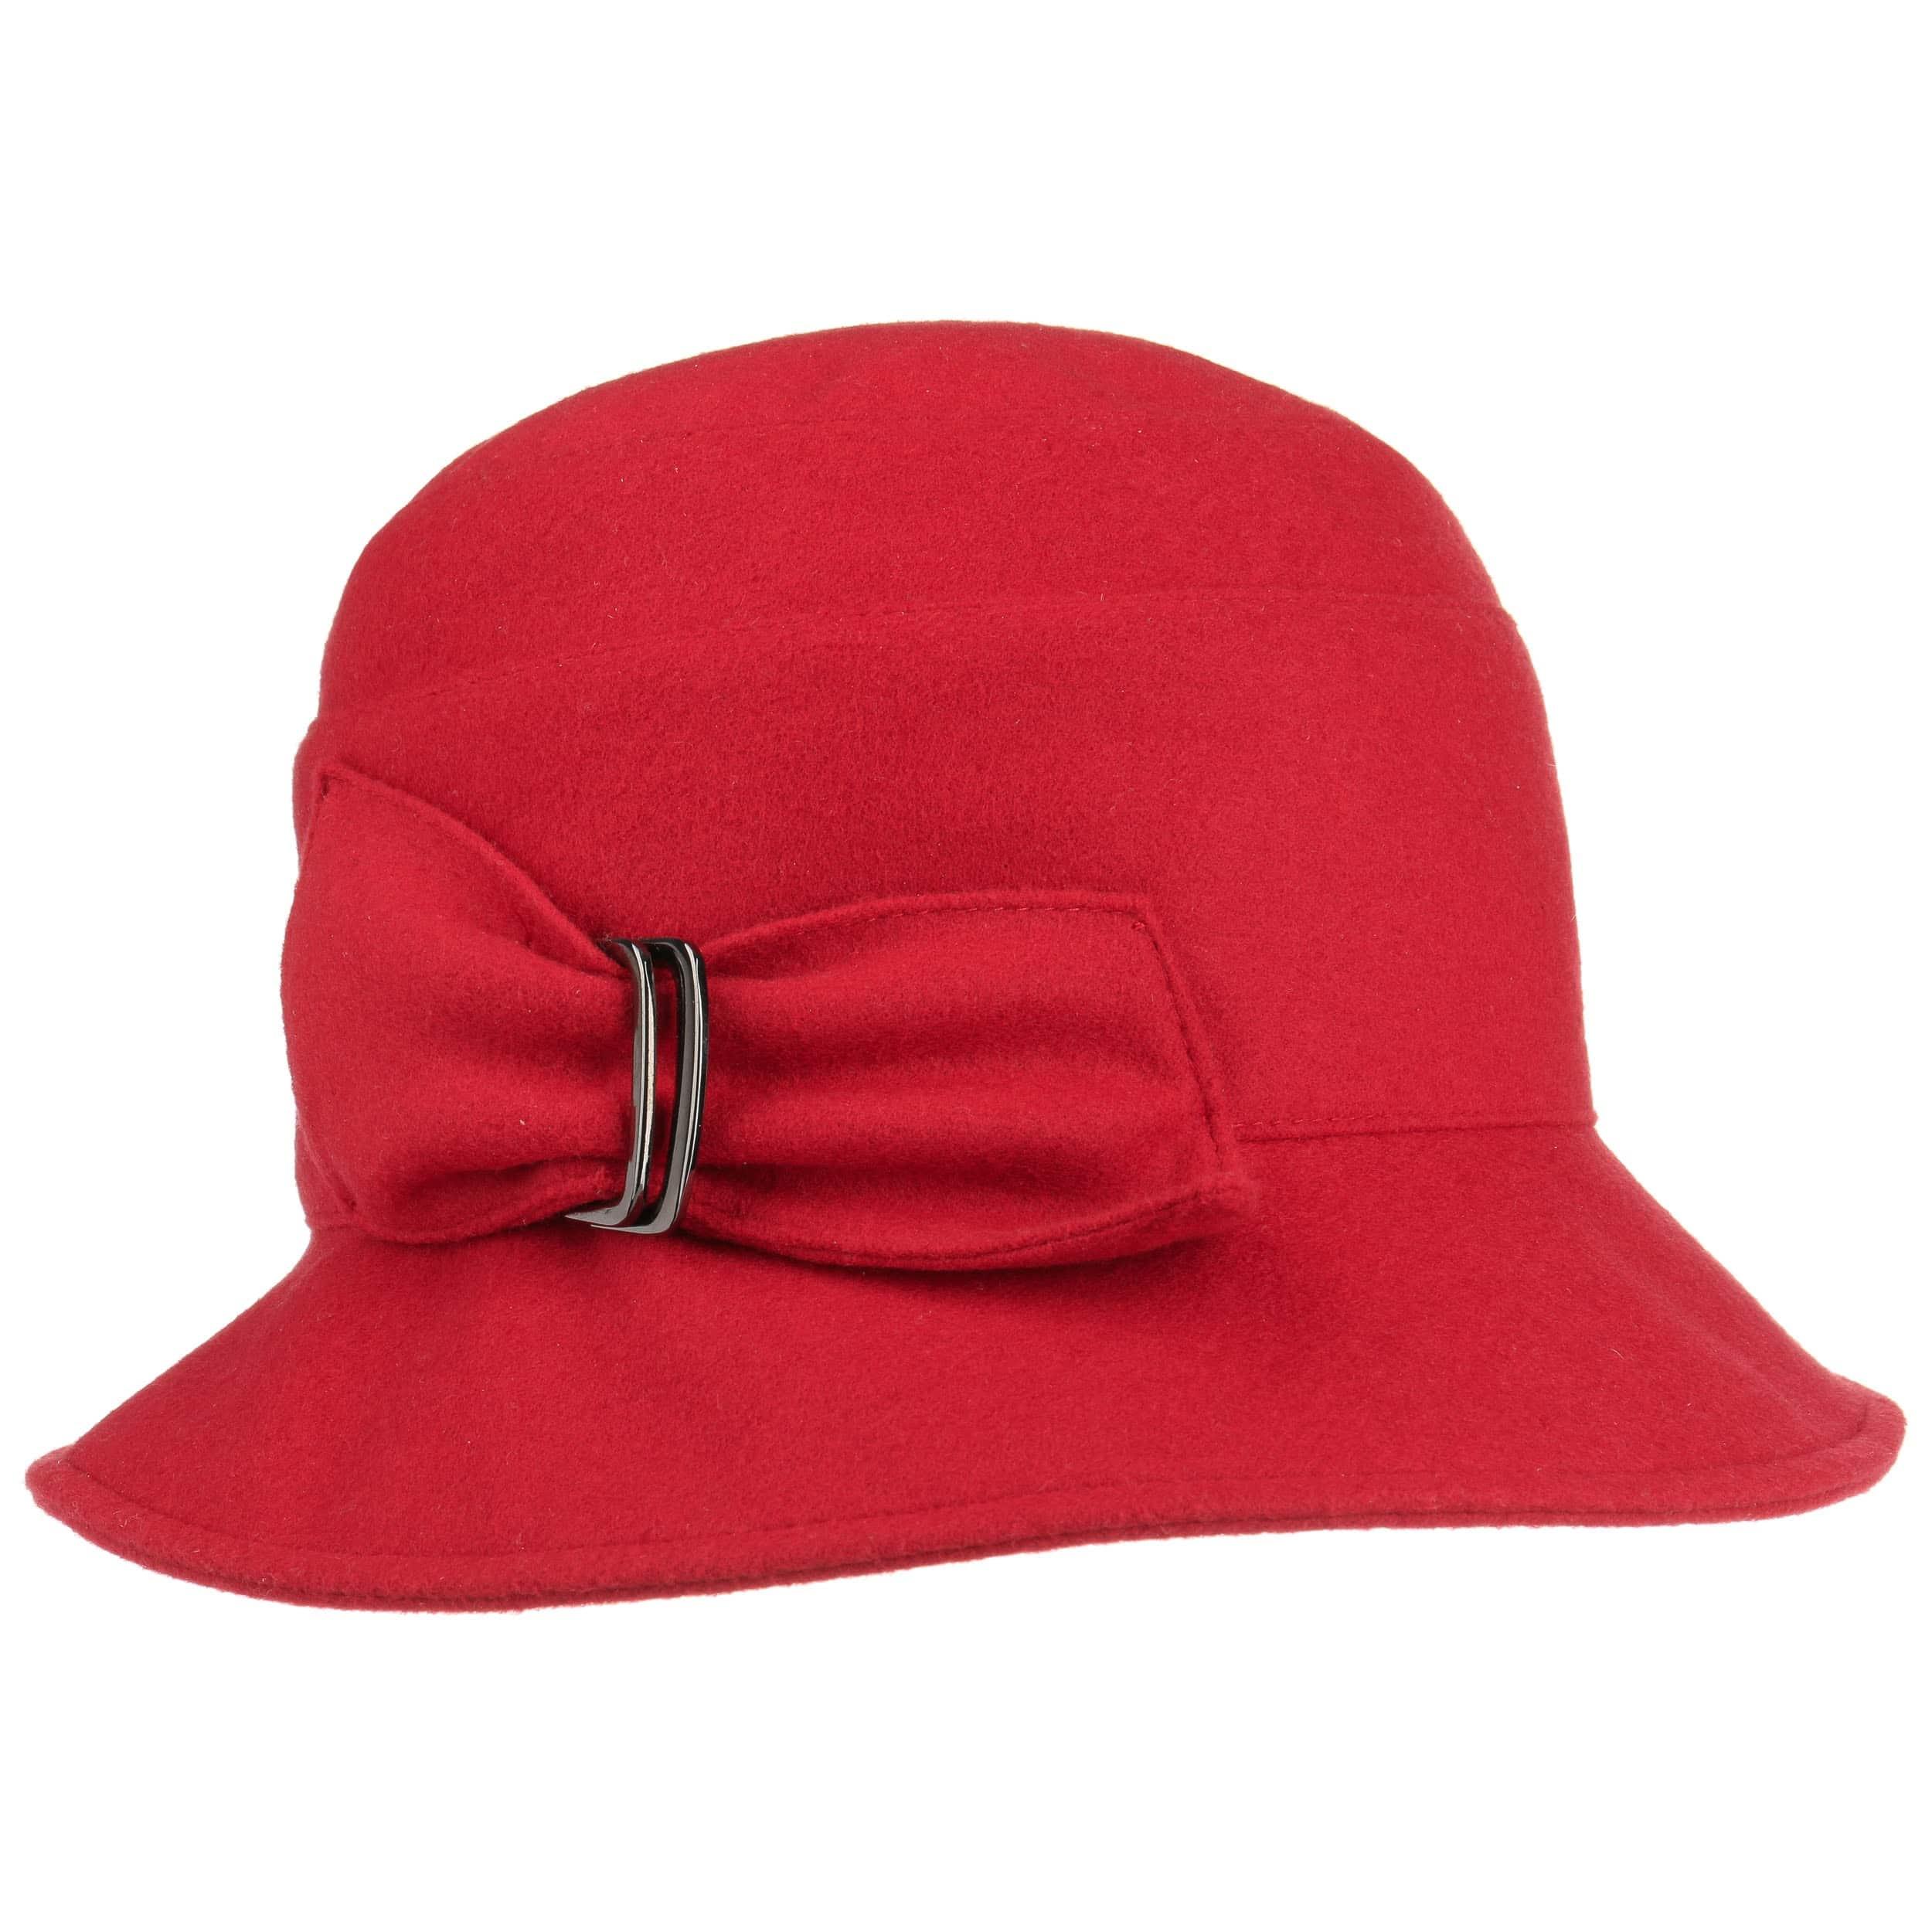 ... Cappello da Donna Kelly Sympatex by Mayser - rosso 6 ... af63e4dc3d2a